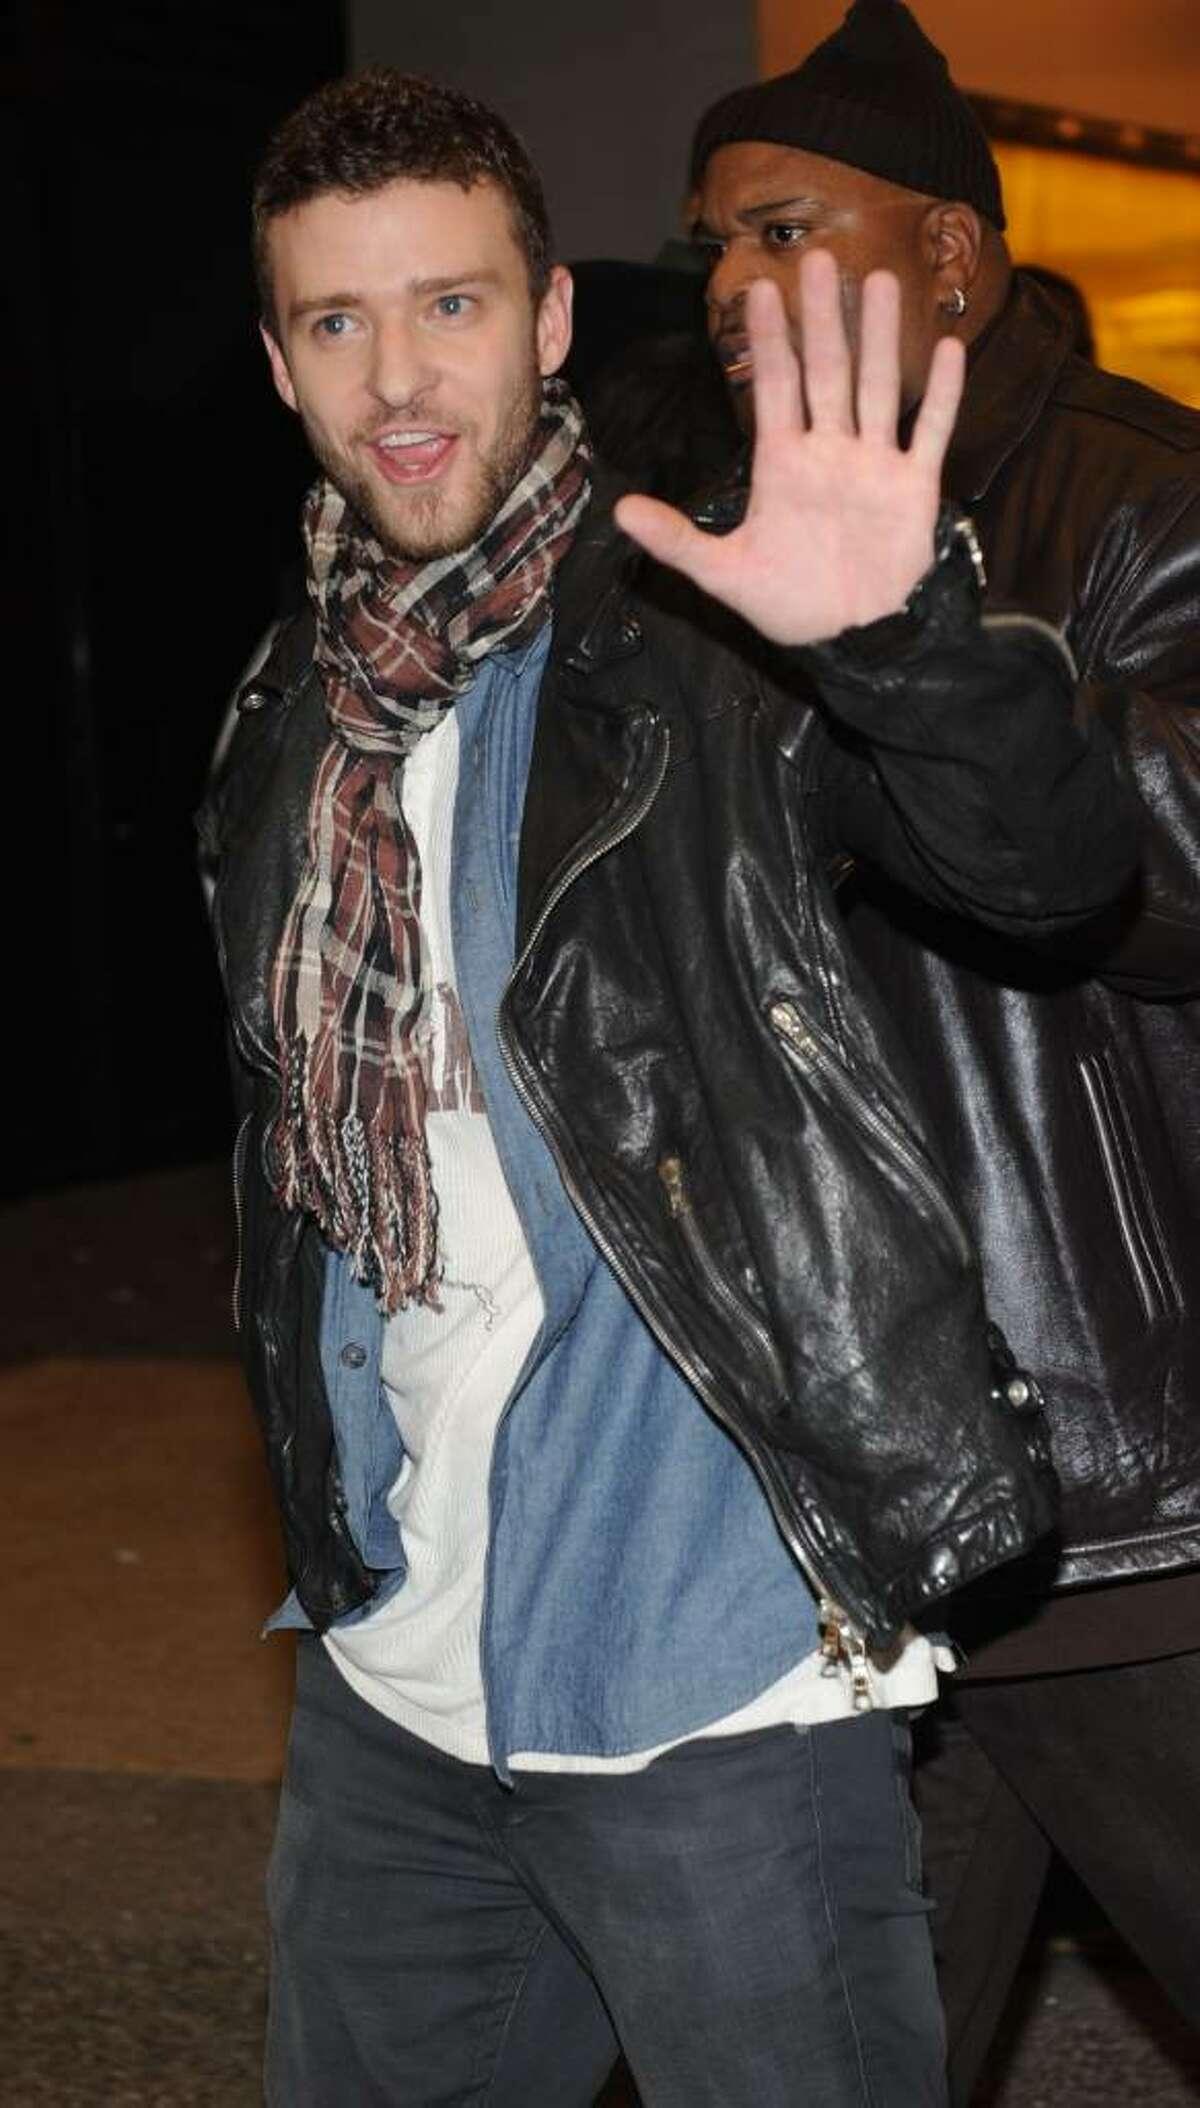 NEW YORK - NOVEMBER 16: Justin Timberlake attends MTV's